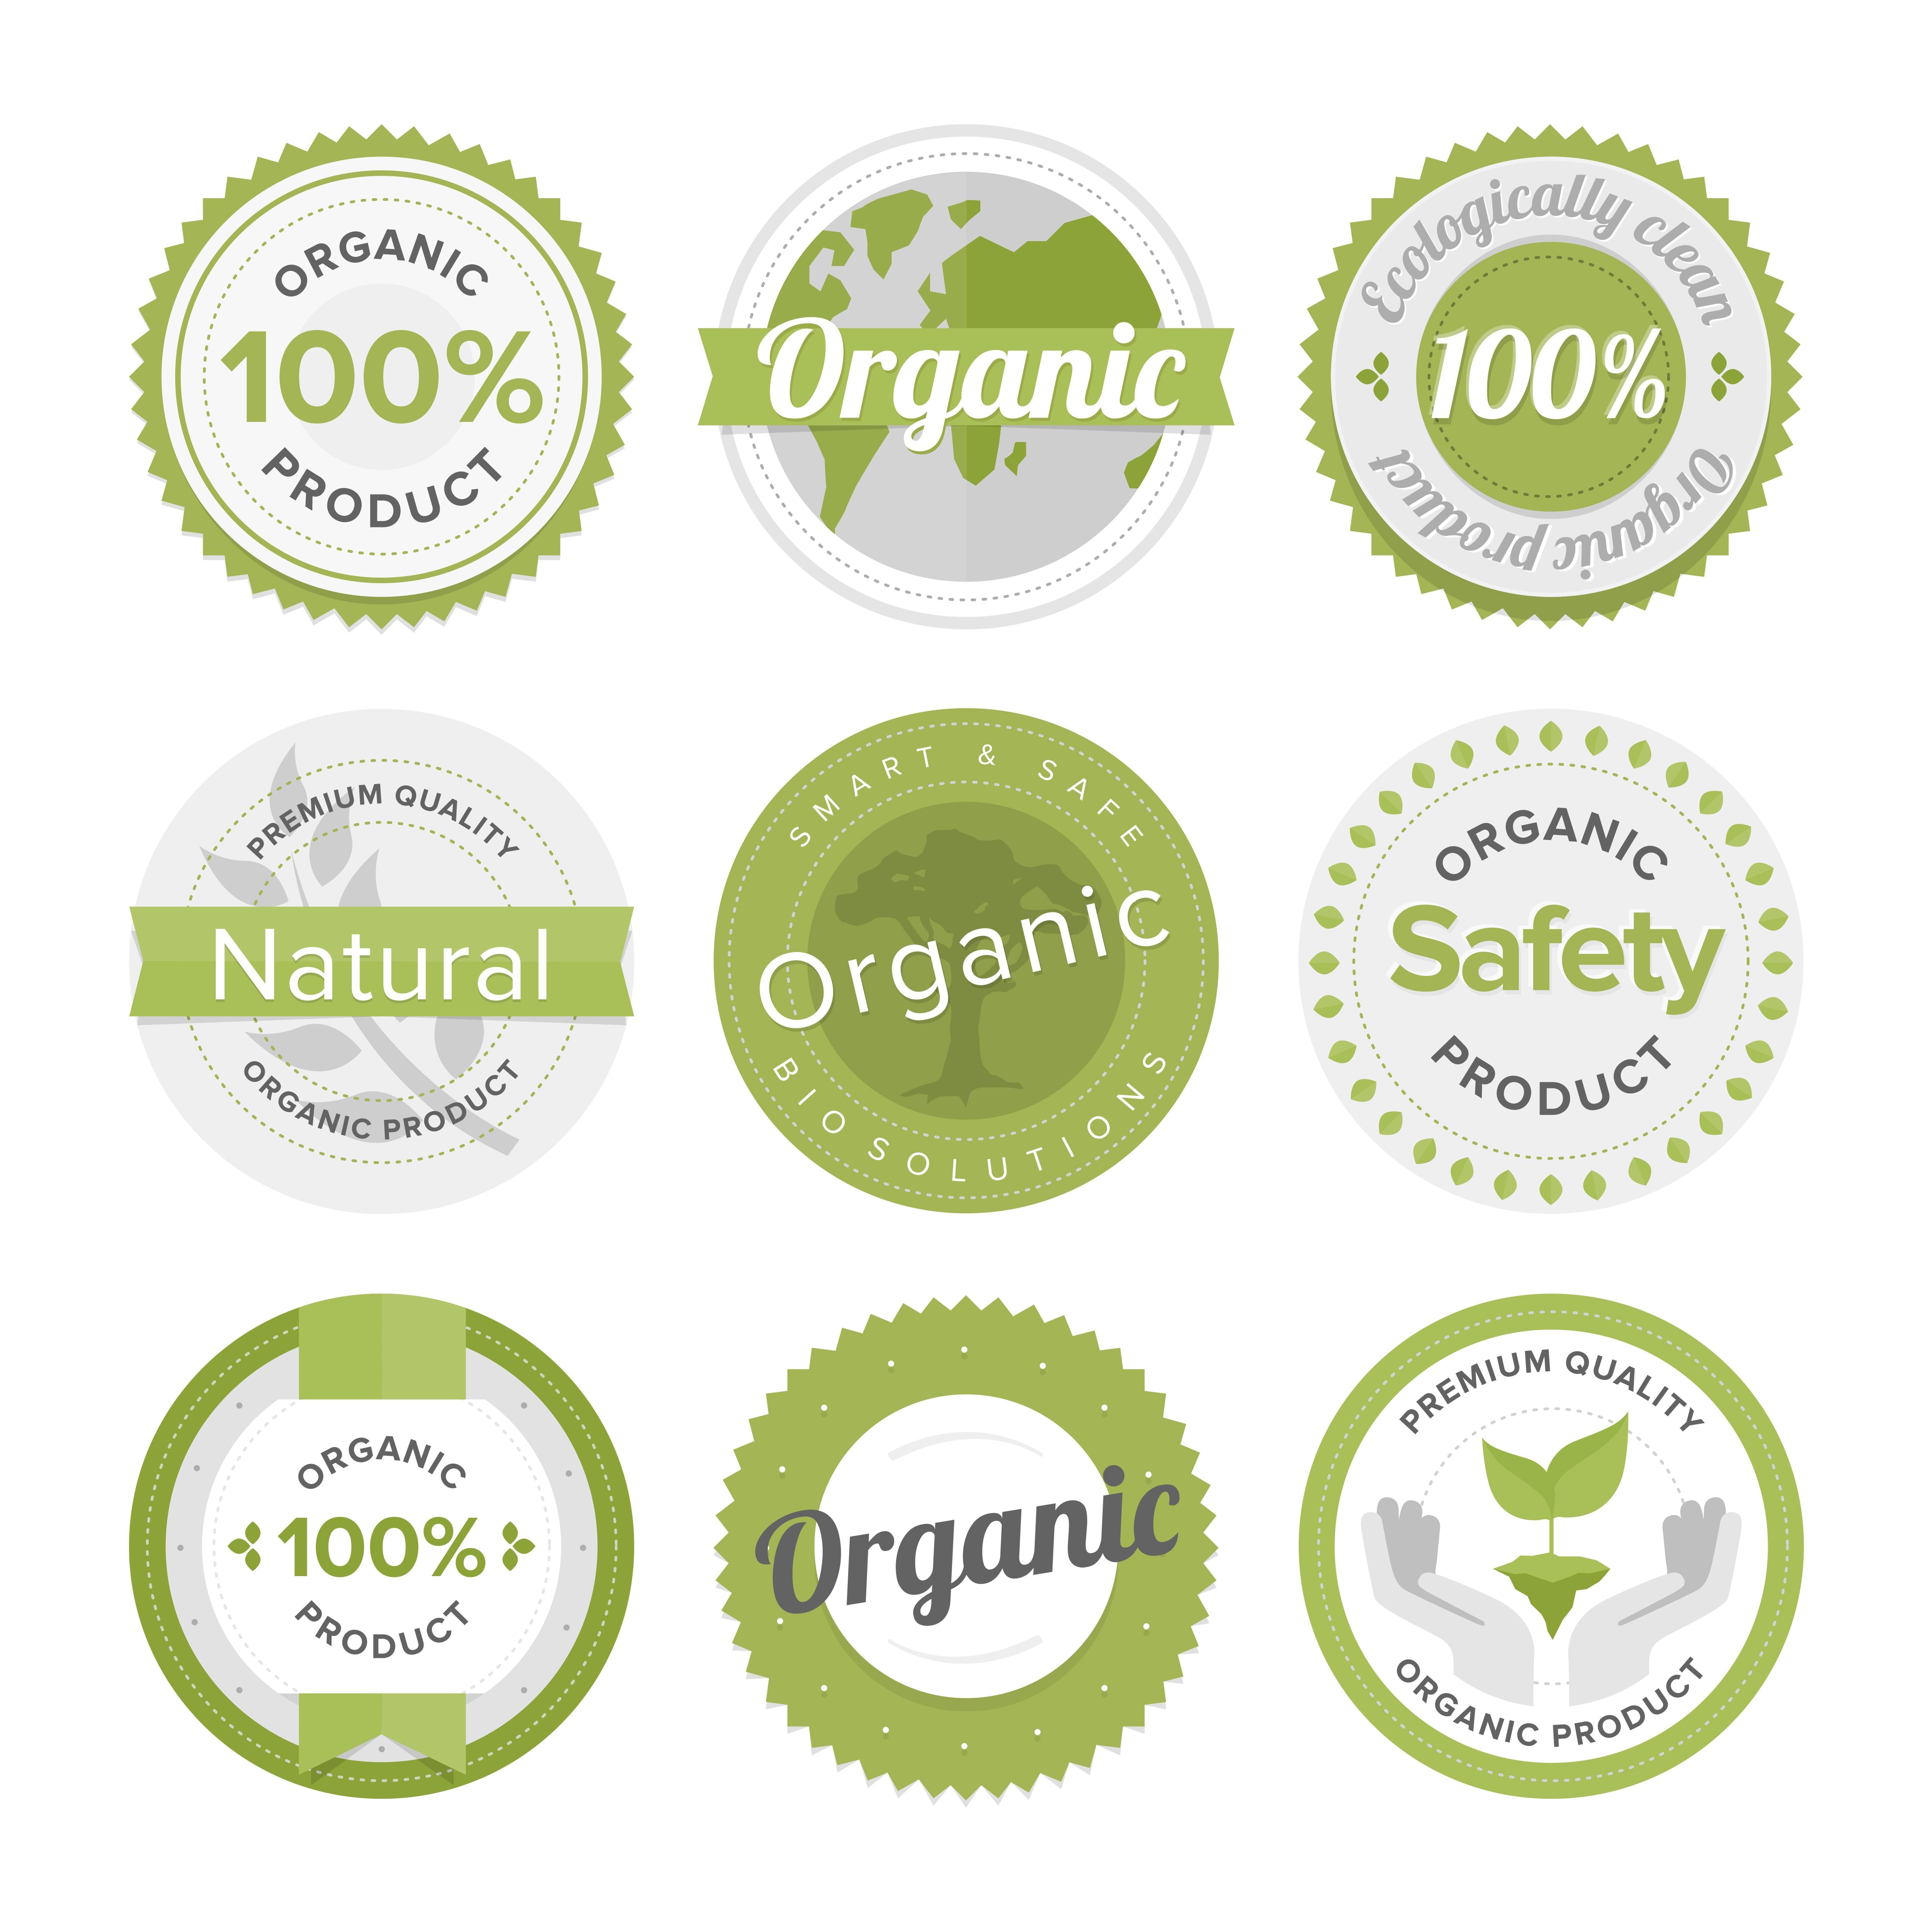 Natural organic product label